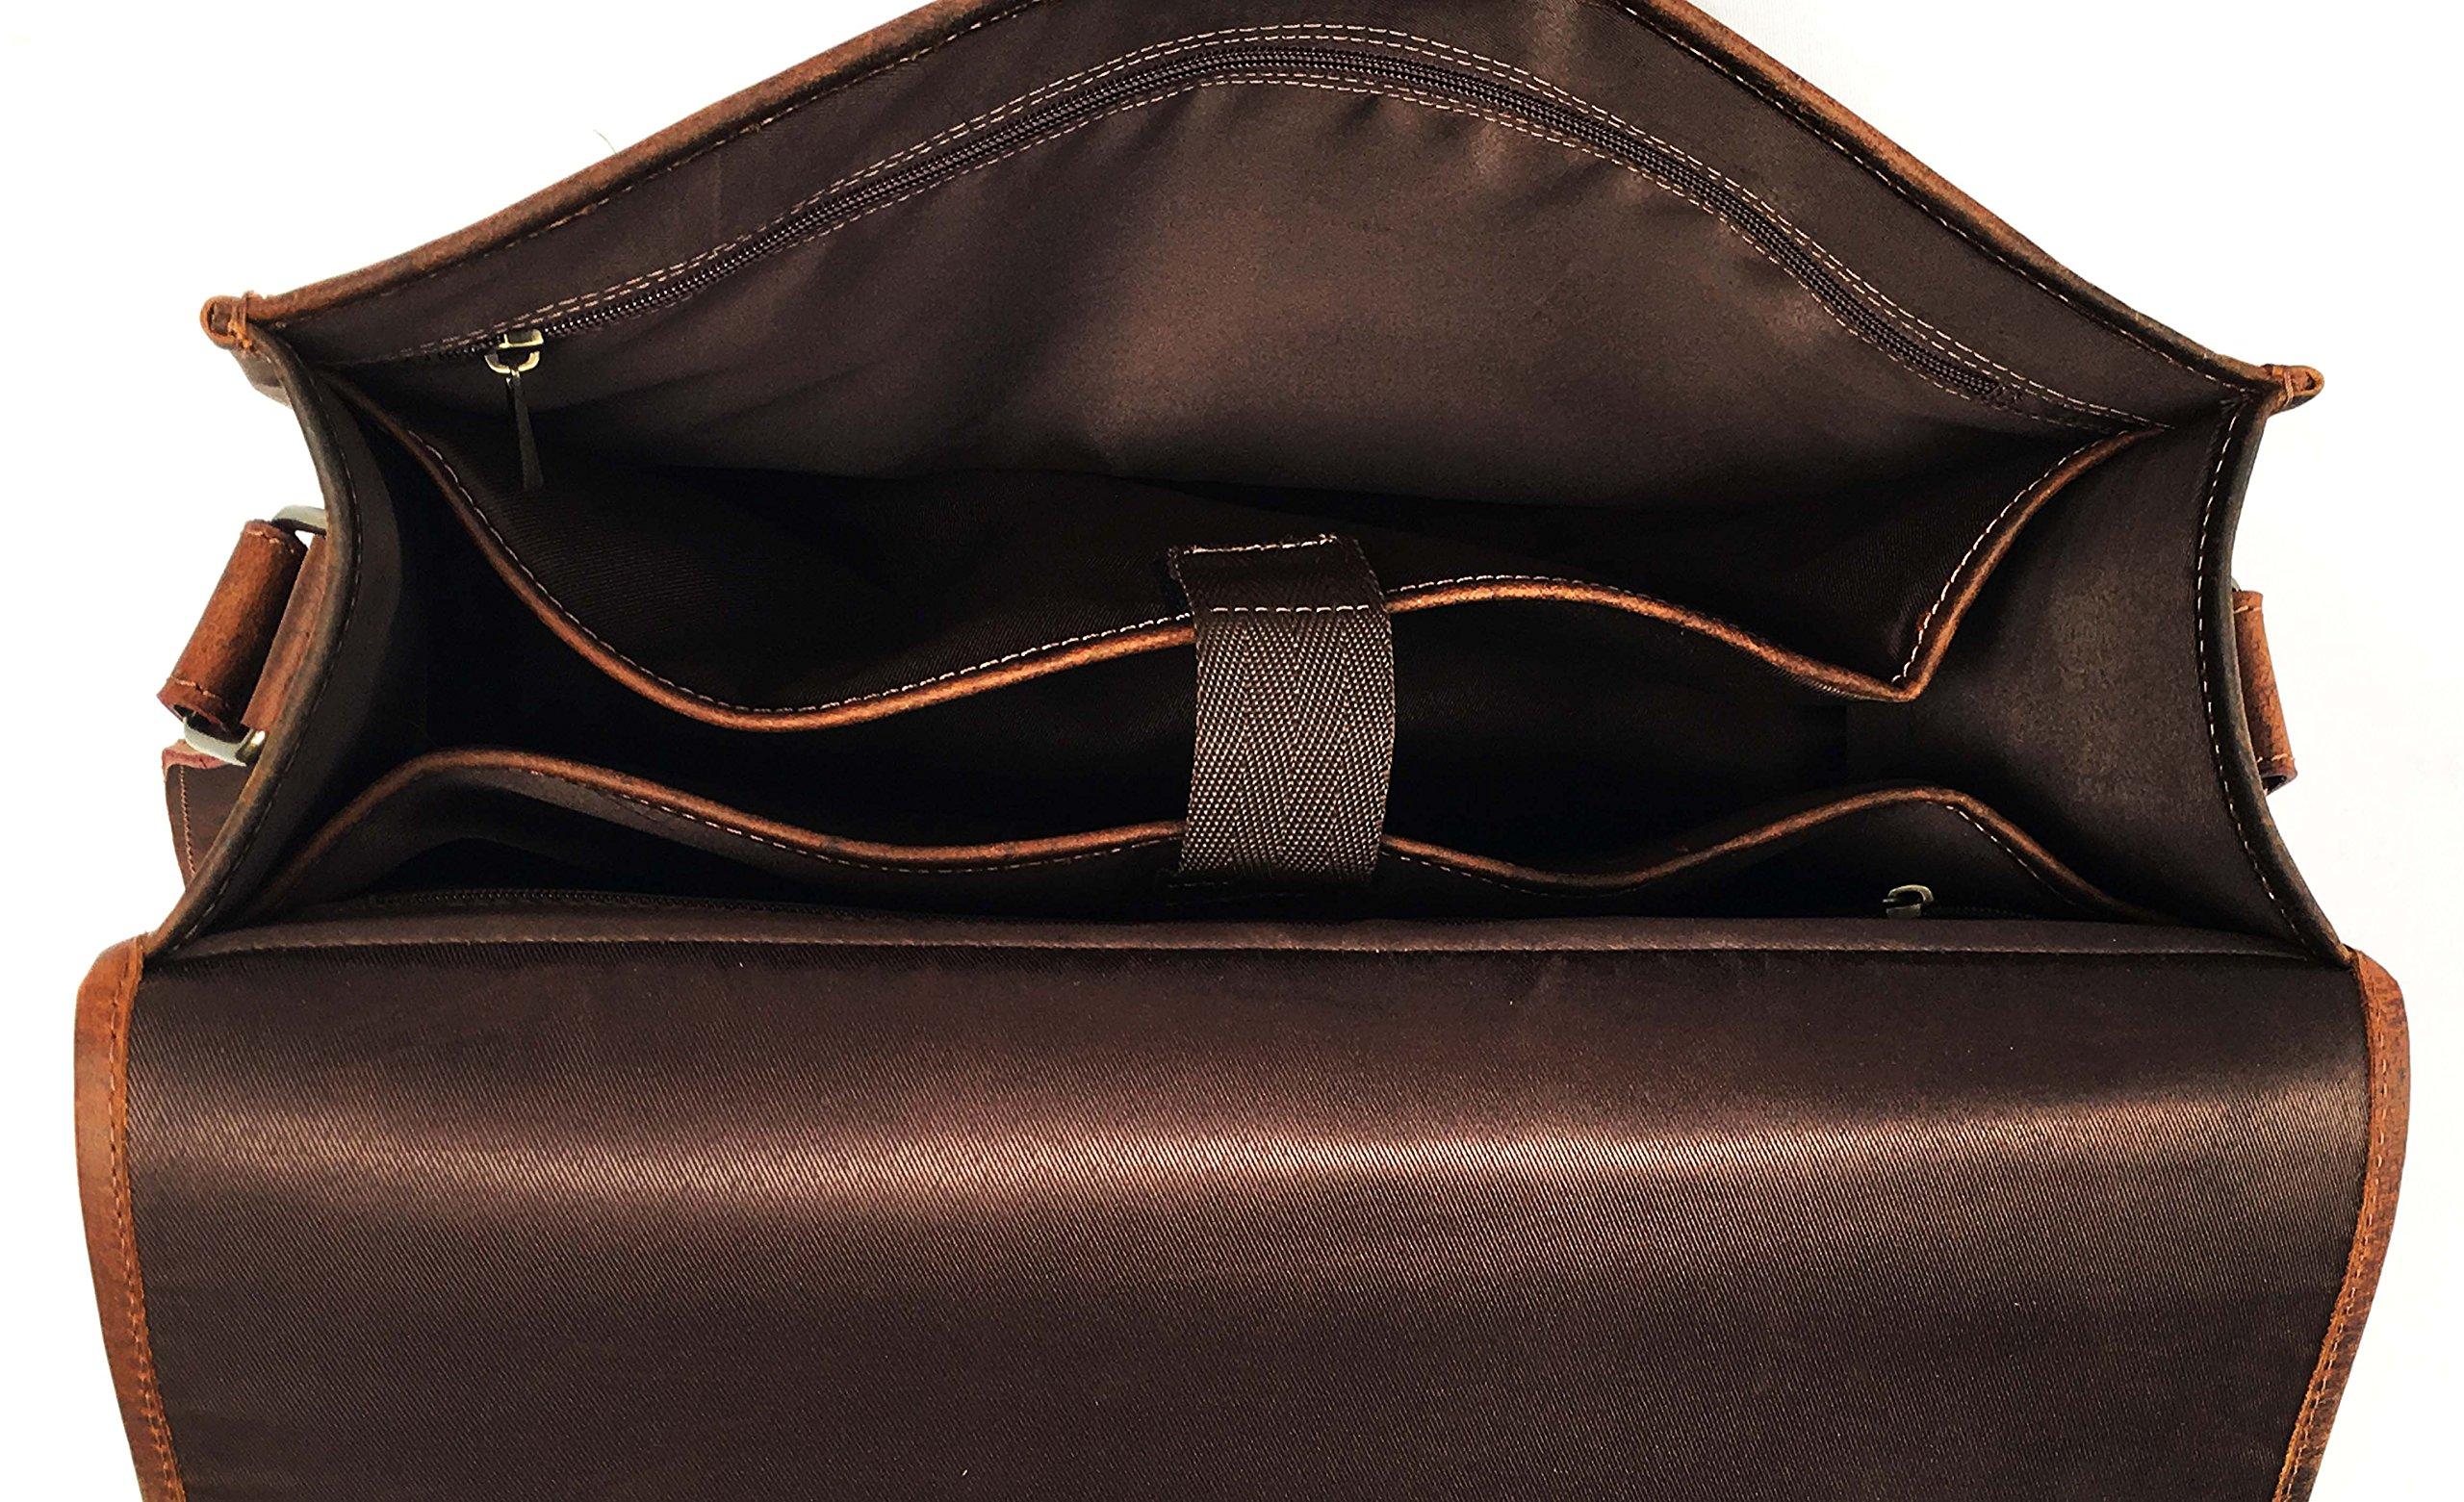 16 Inch Leather Vintage Rustic Crossbody Messenger Courier Satchel Bag Gift Men Women ~ Business Work Briefcase Carry Laptop Computer Book Handmade Rugged & Distressed By KK's Leather by kk's leather (Image #6)